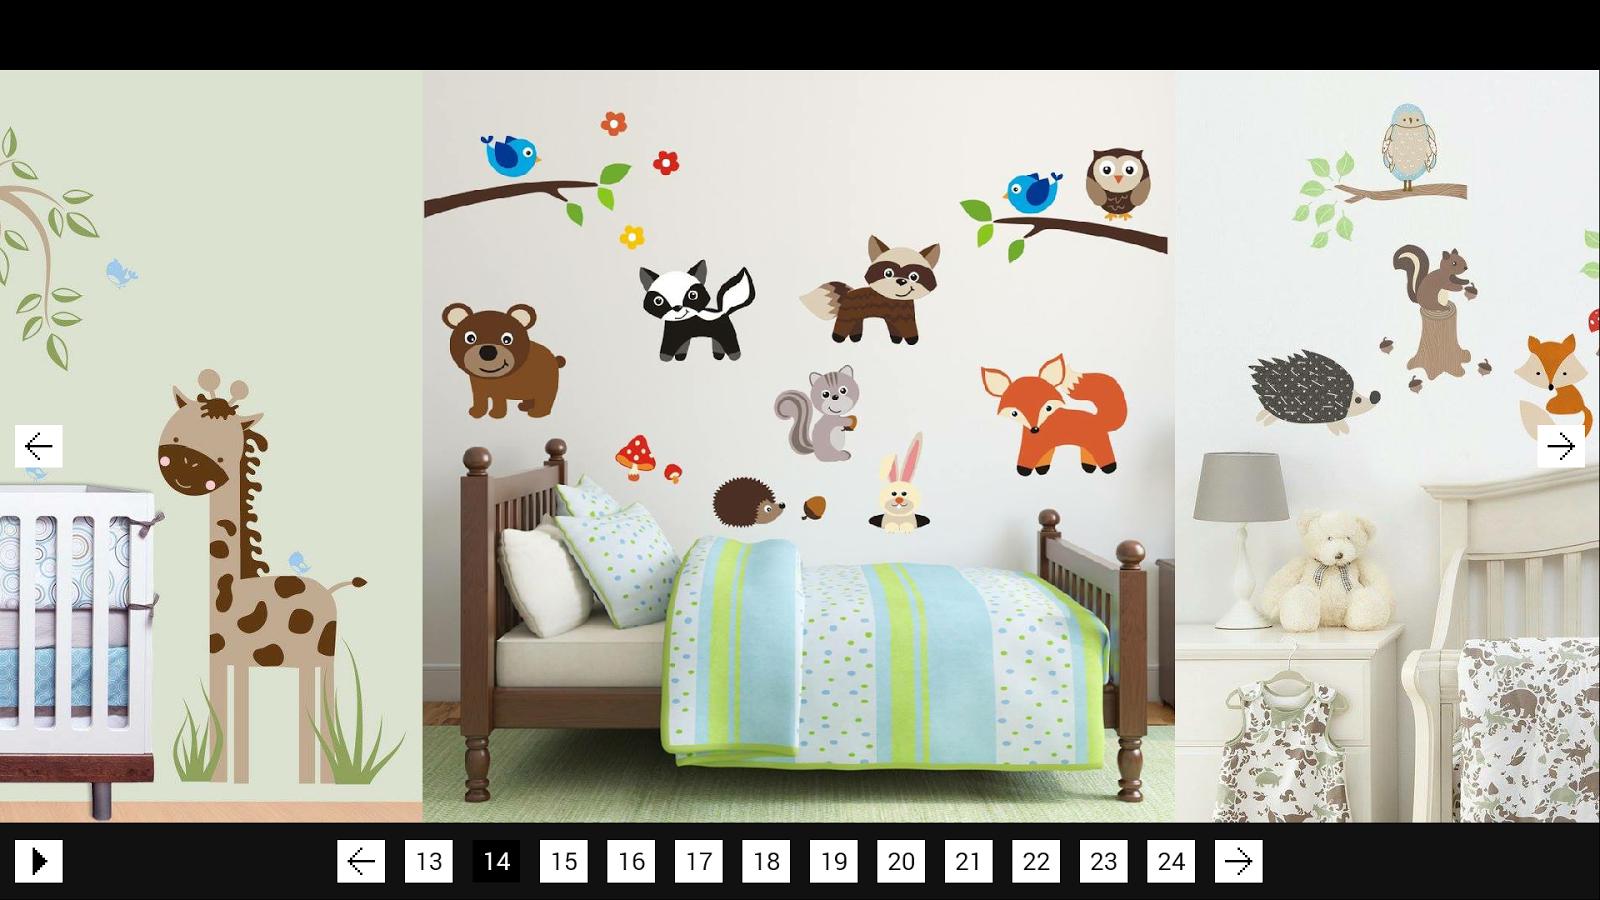 Wall art decor android apps on google play wall art decor screenshot amipublicfo Choice Image